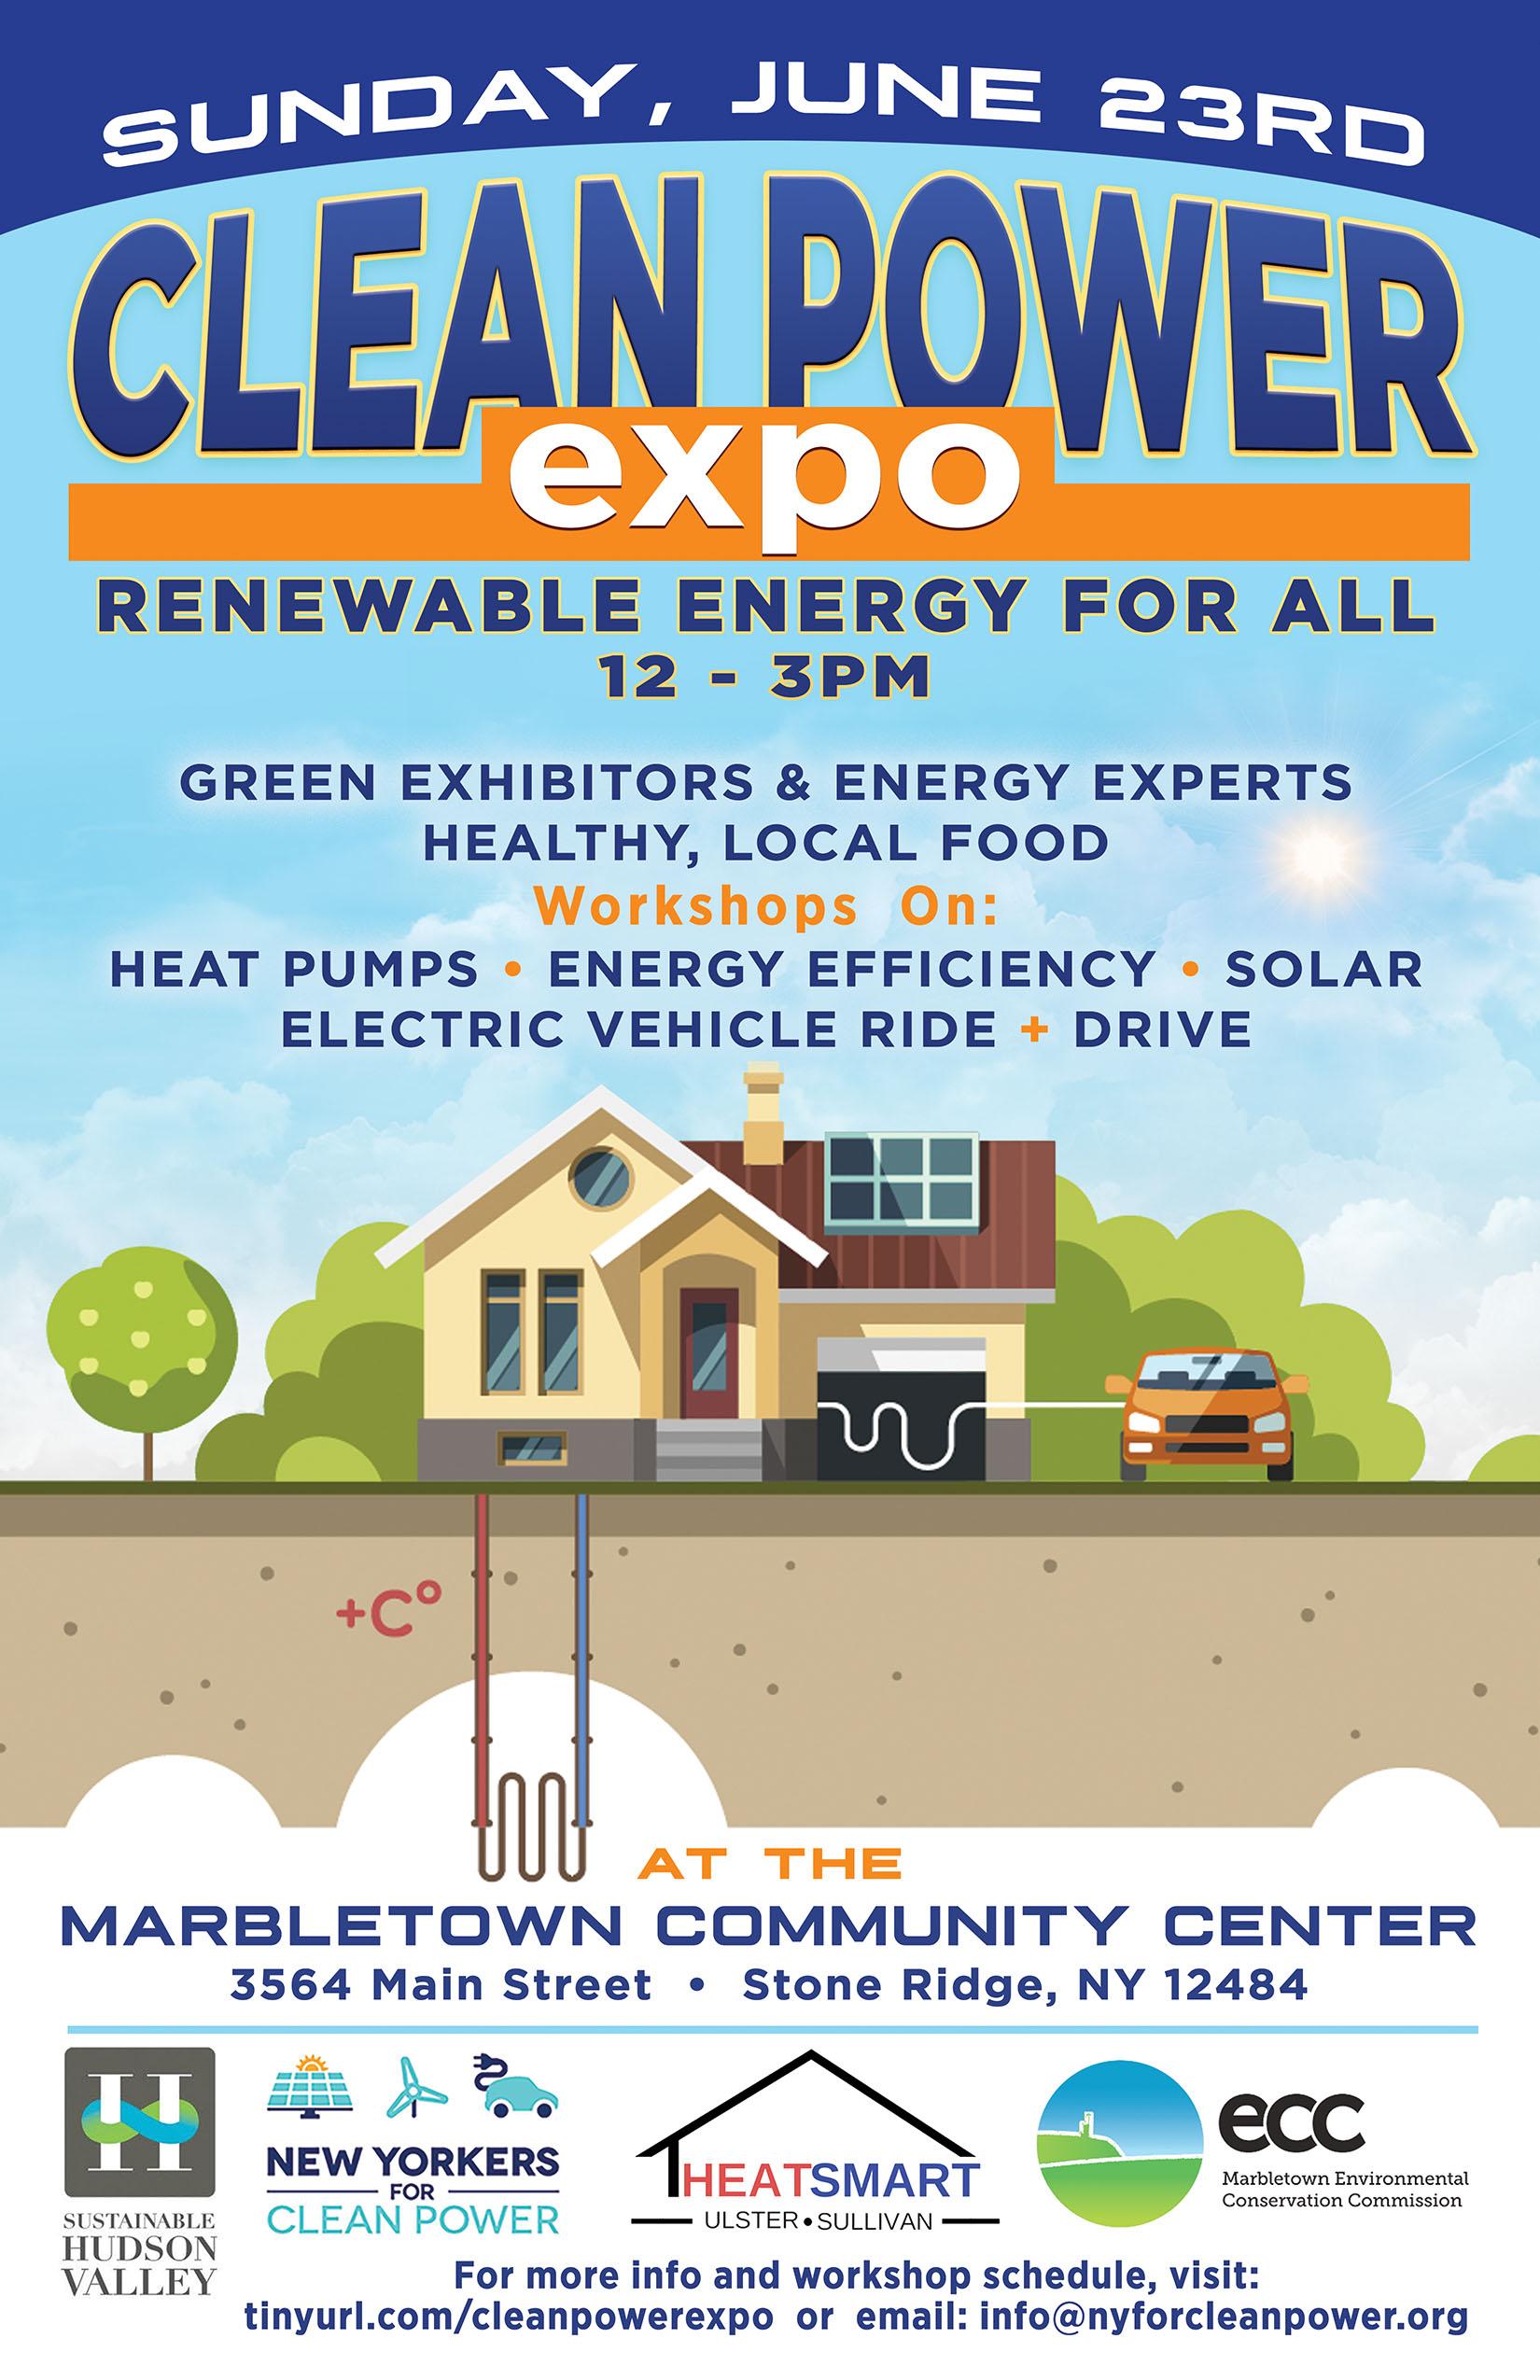 6-23-19 Clean Power Expo flyer.jpg